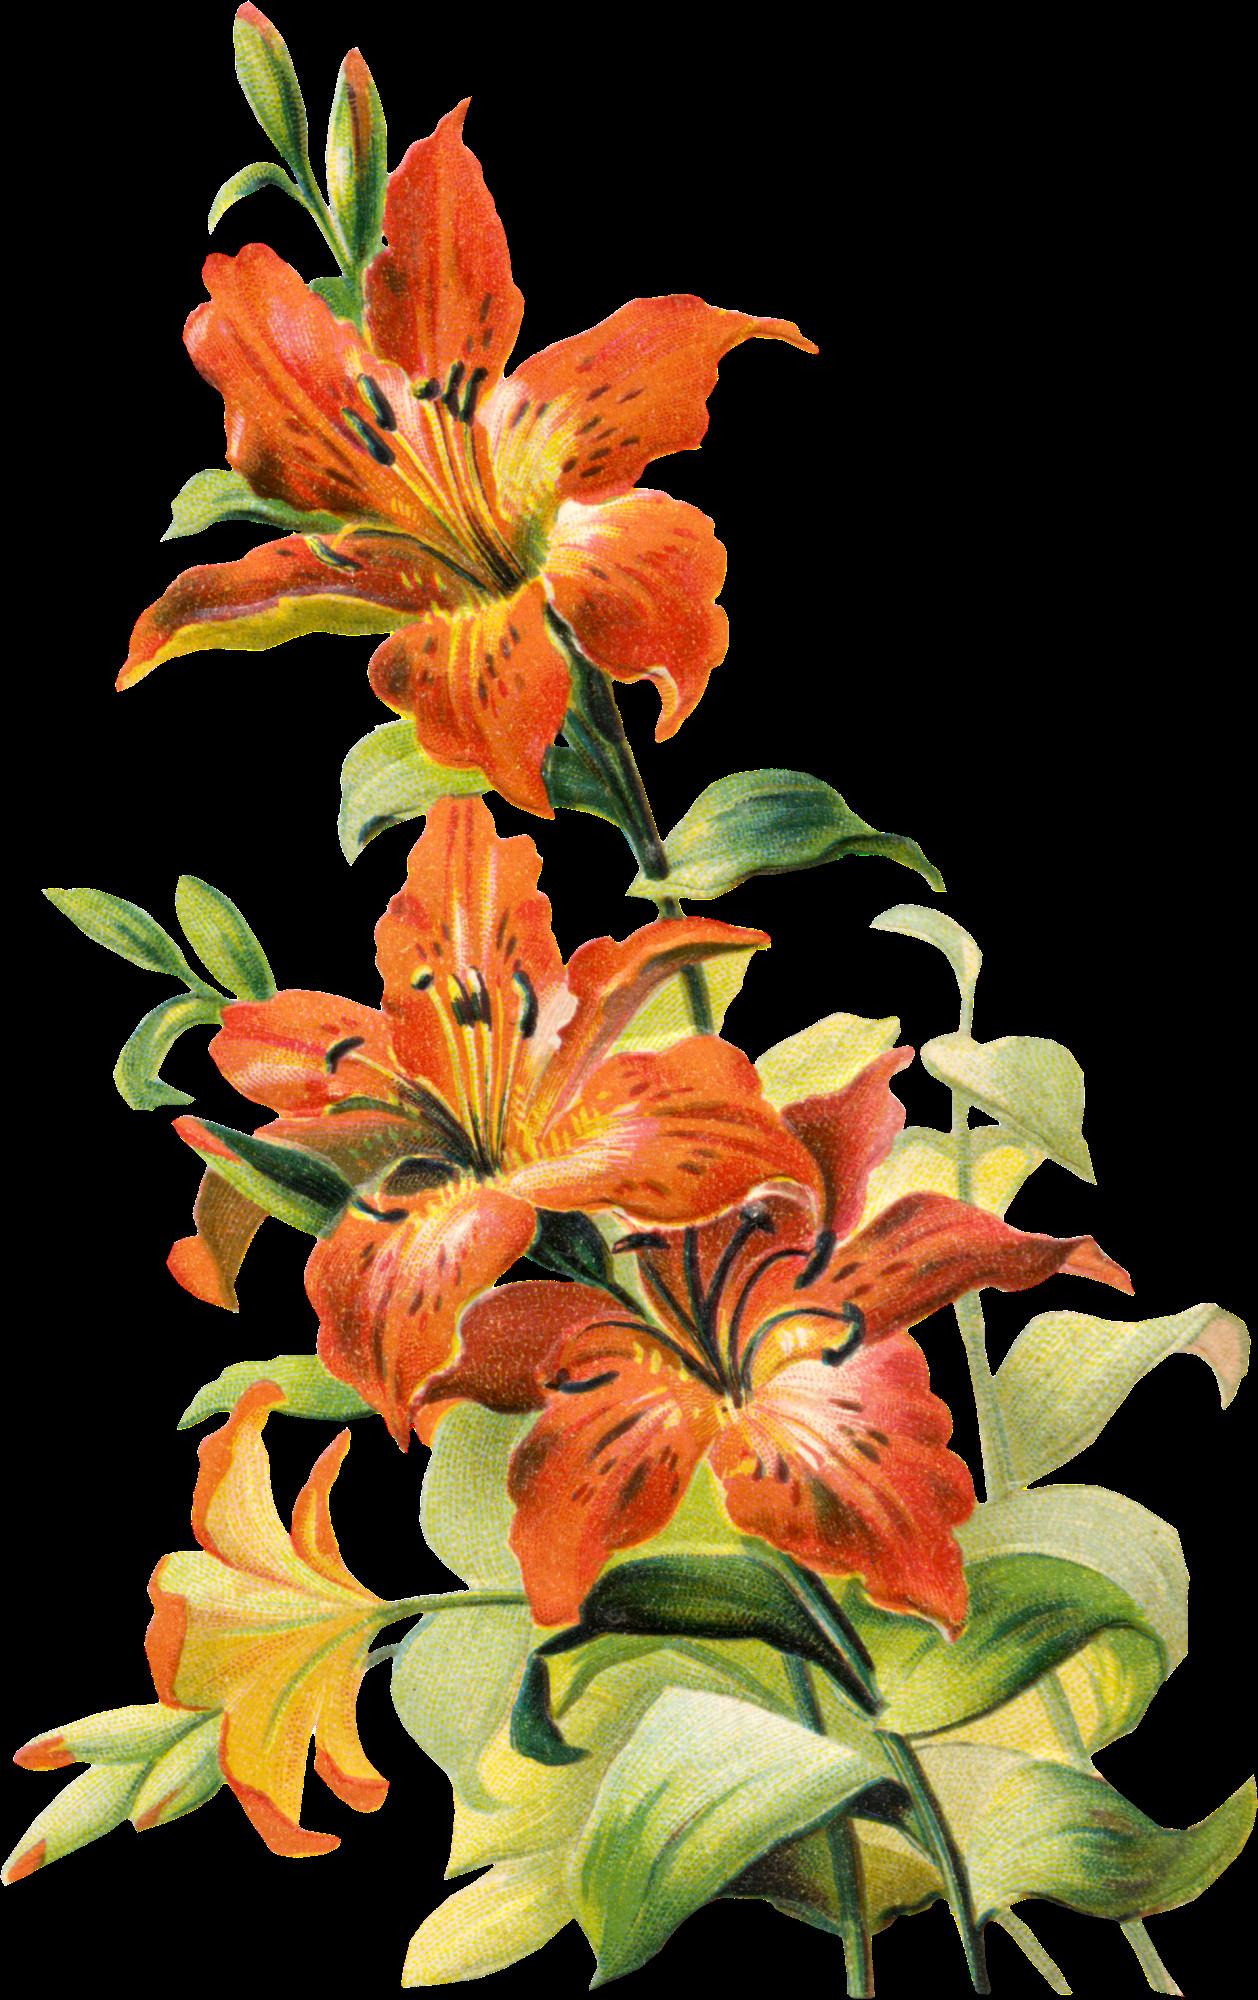 Tiger Lily Flower Best Of Free Vintage Tiger Lily Flower Ephemera Pinterest